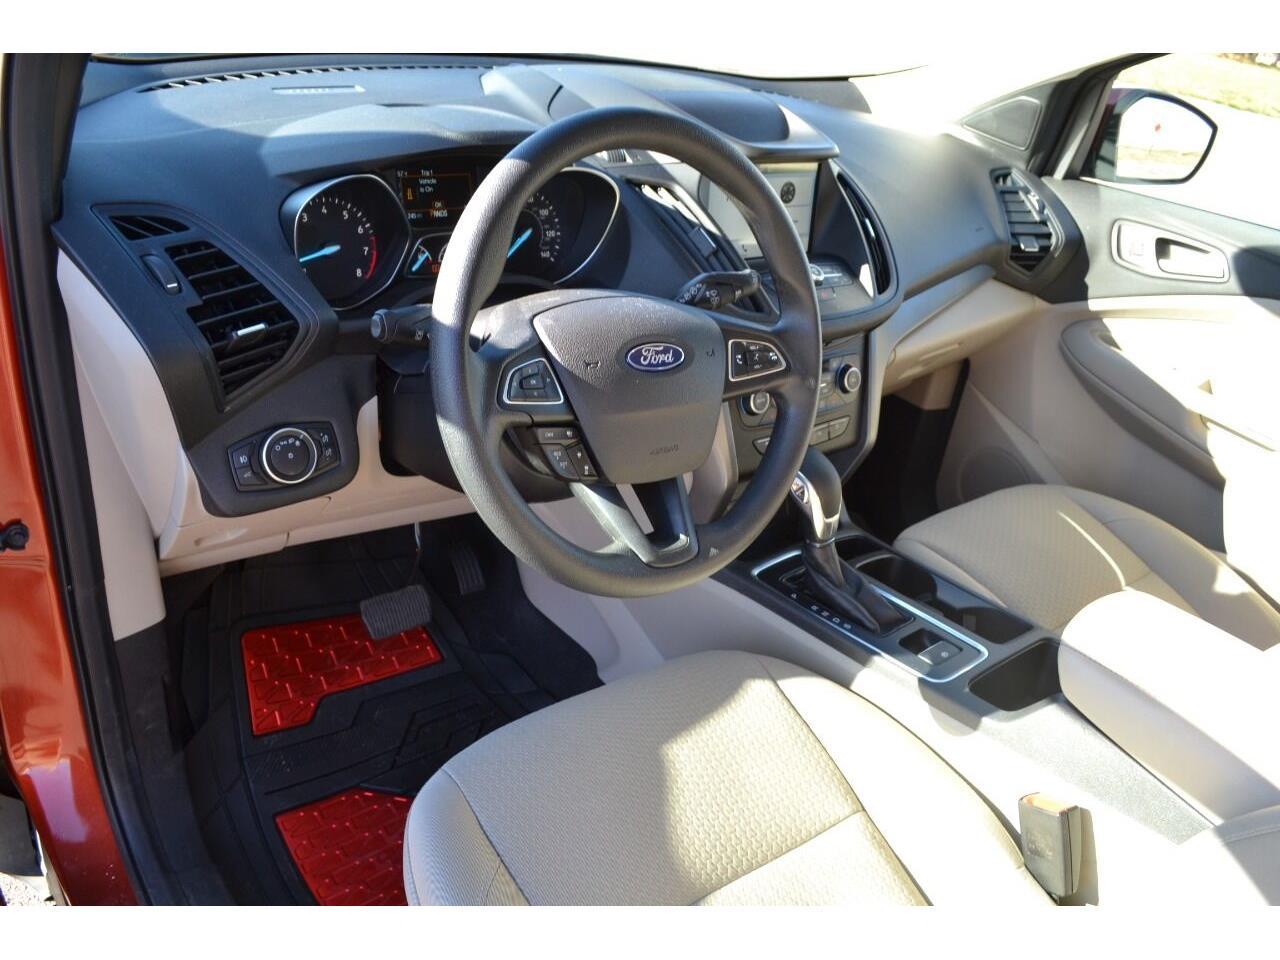 2019 Ford Escape (CC-1419661) for sale in Ramsey, Minnesota